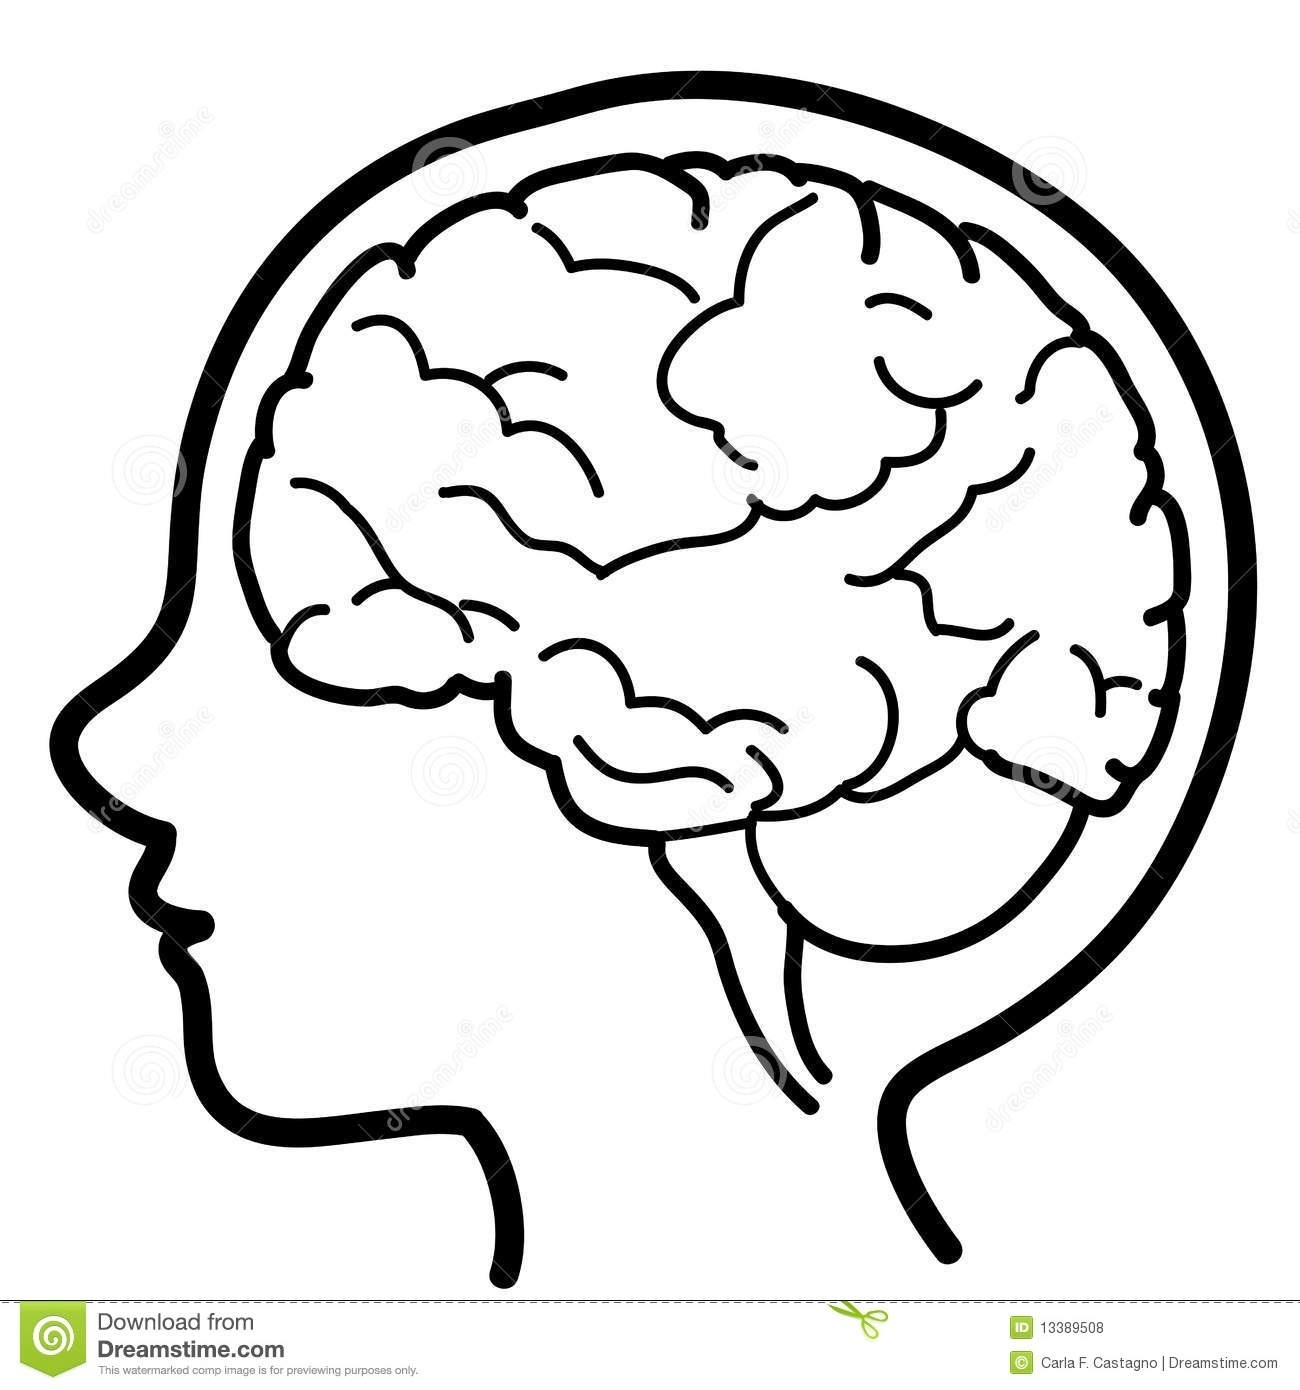 Thinking Brain Clipart Black And White Hd.